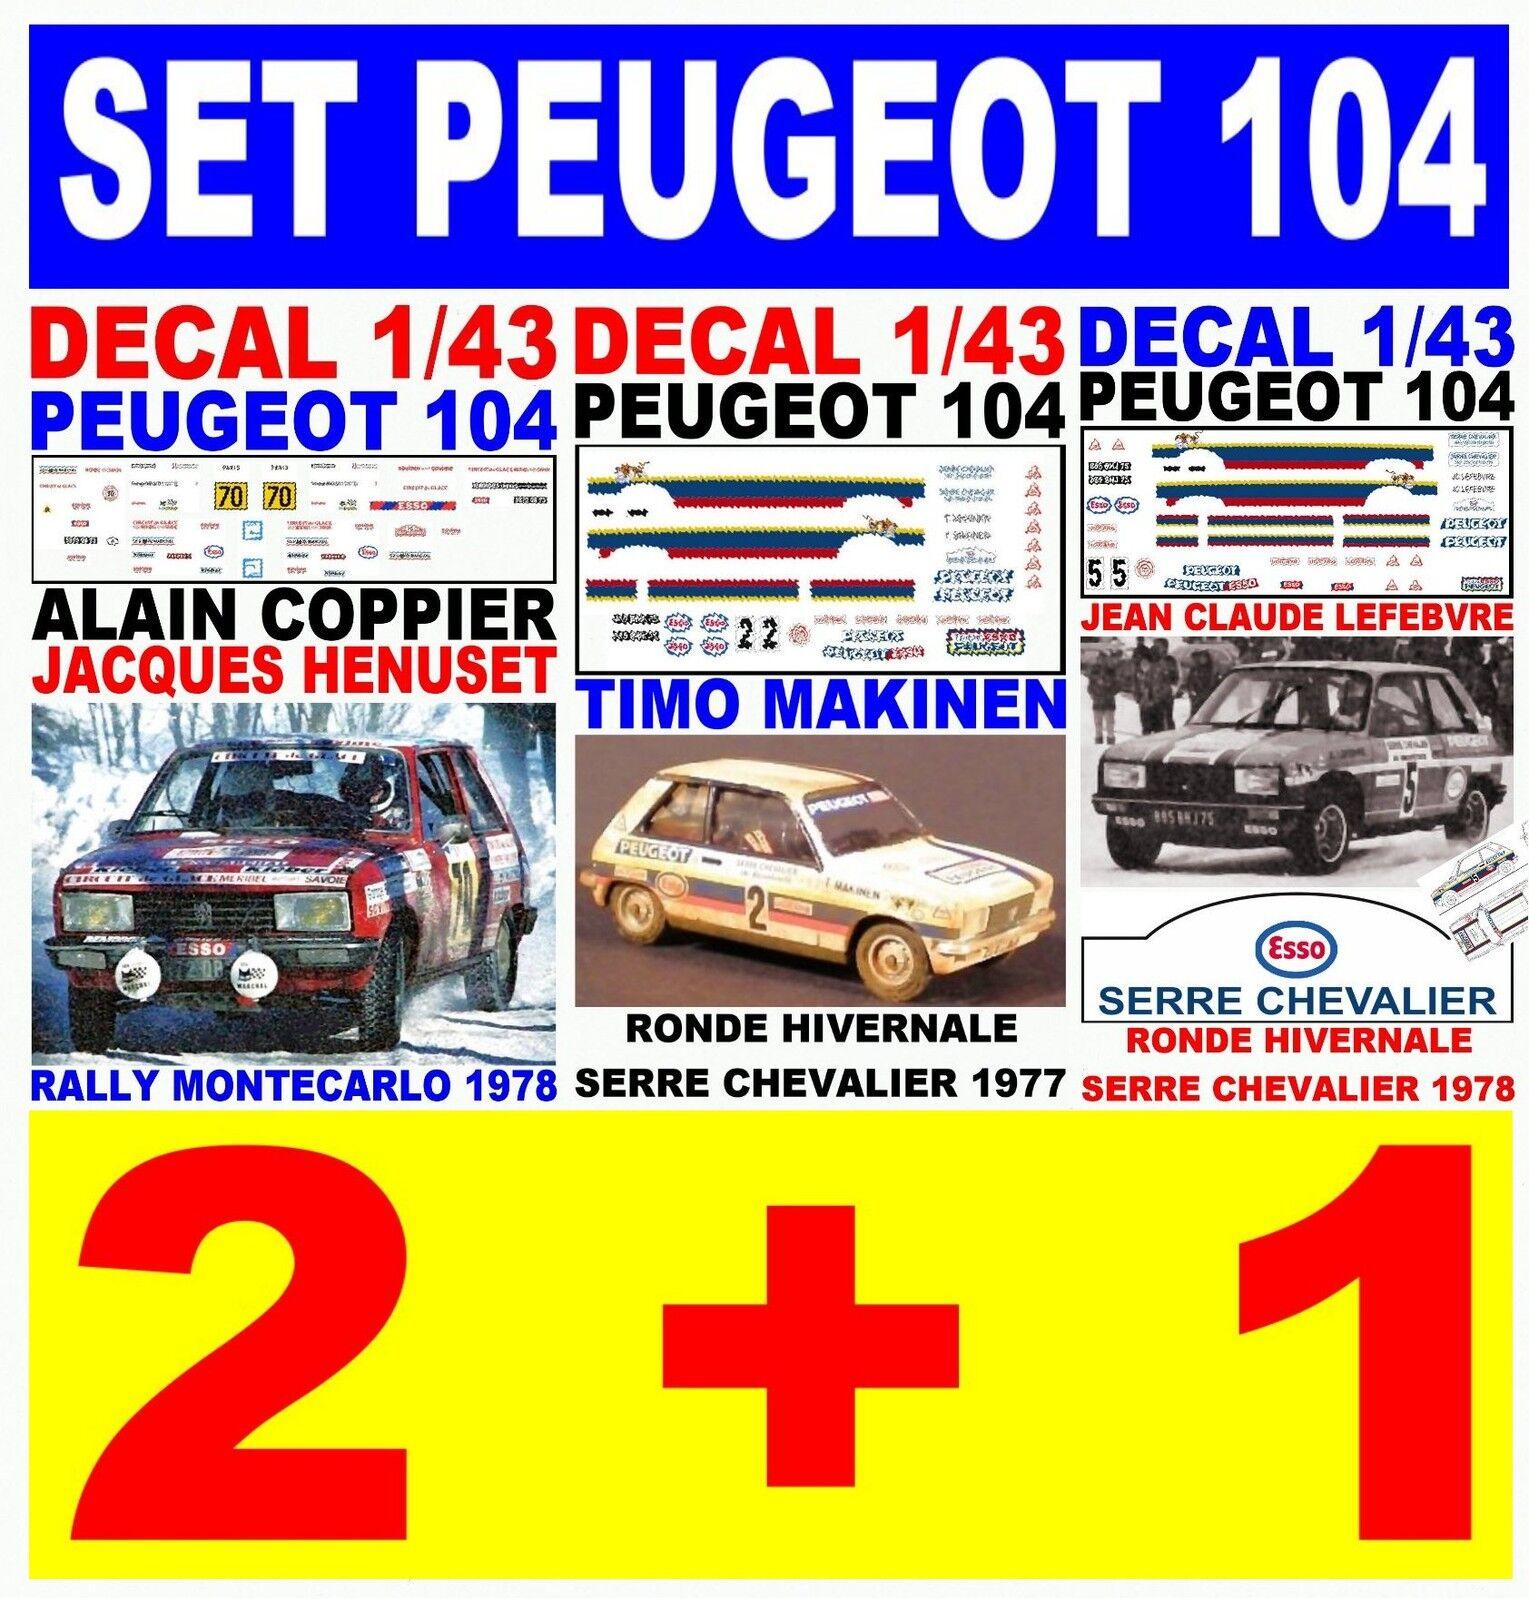 DECAL 1 1 1 43 SET PEUGEOT 104  (03) 3aef23